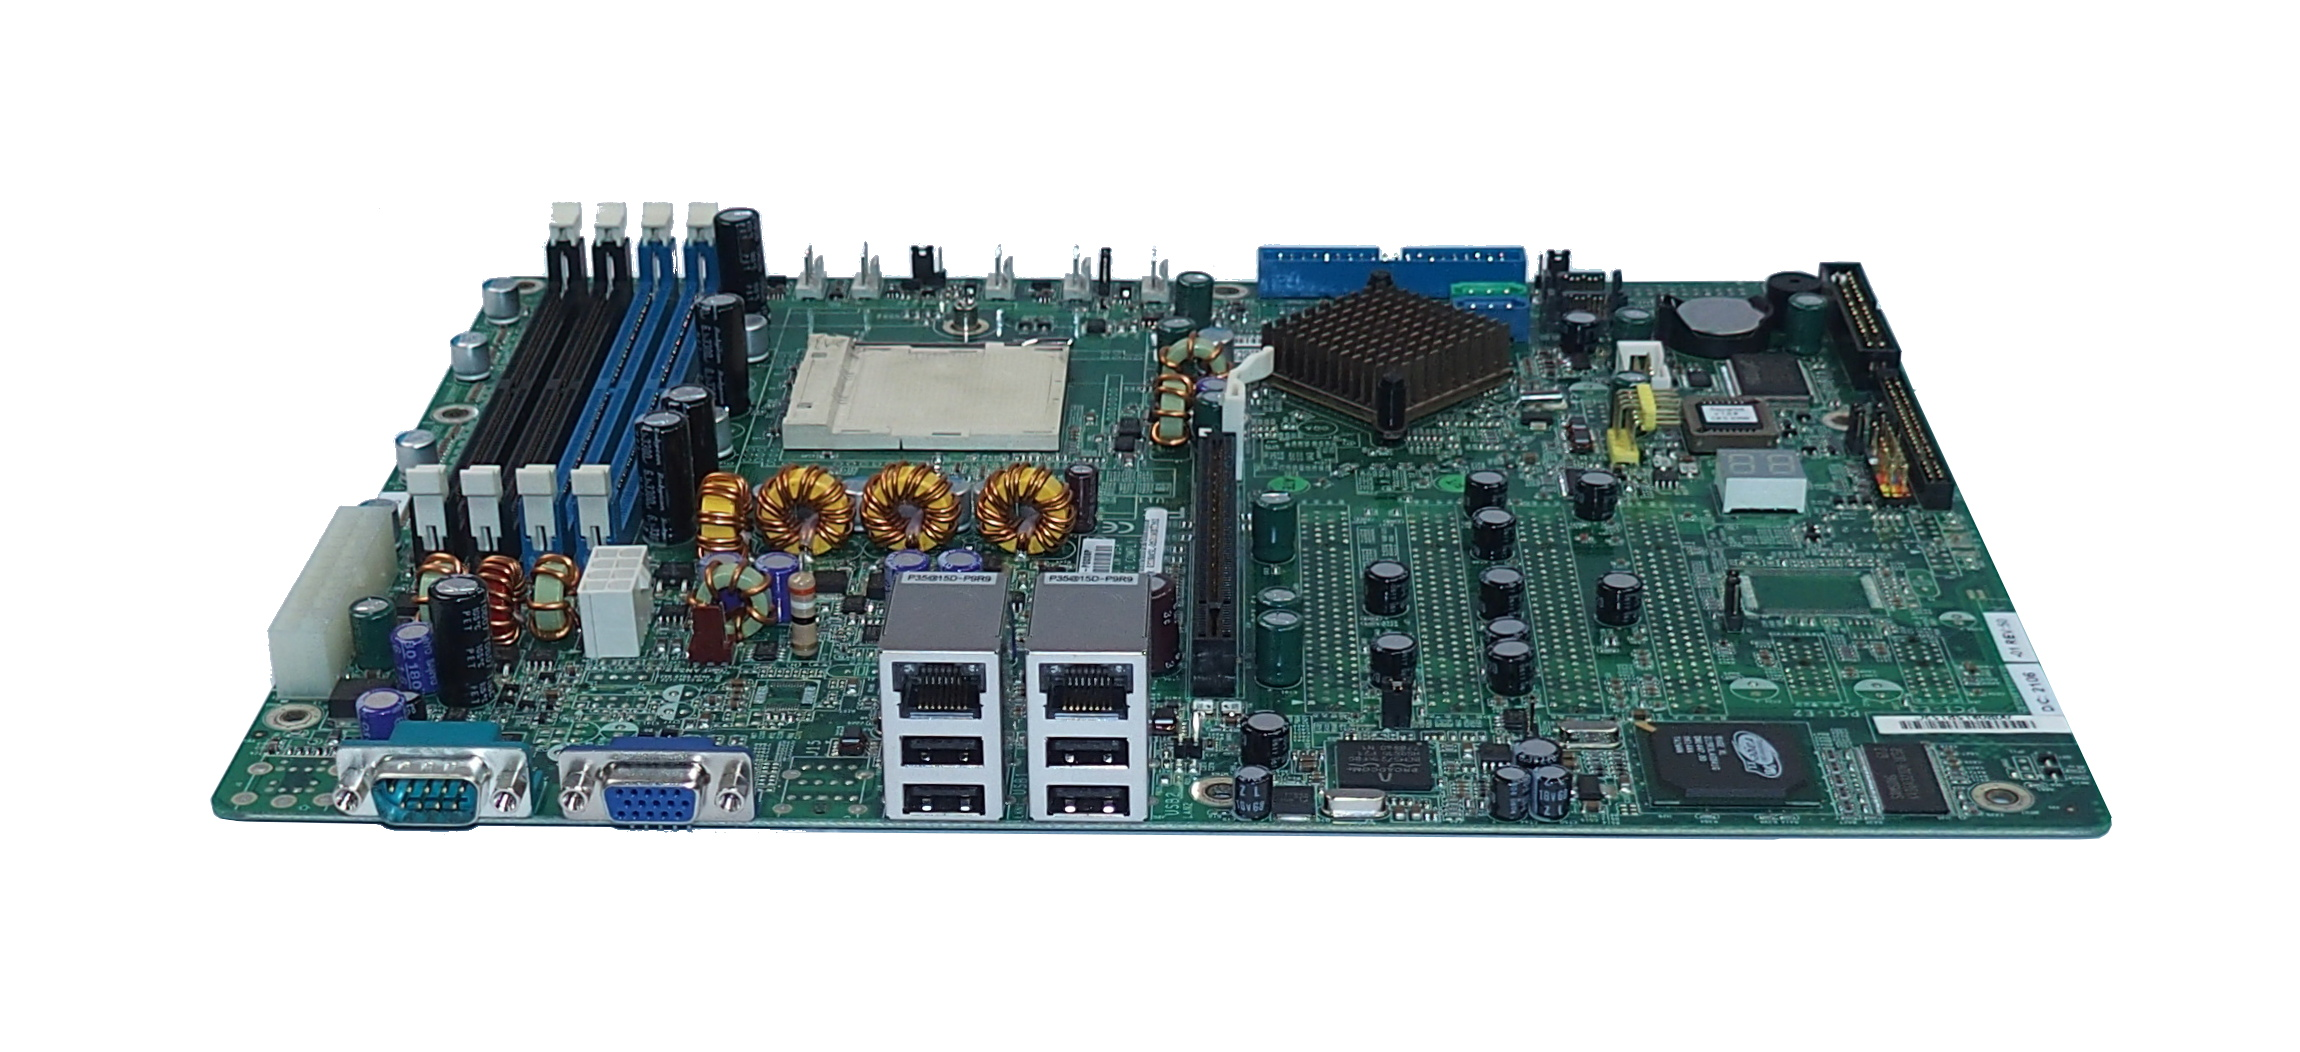 Sun 375-3427-01 Socket 939 Motherboard For Sunfire X2100 Server